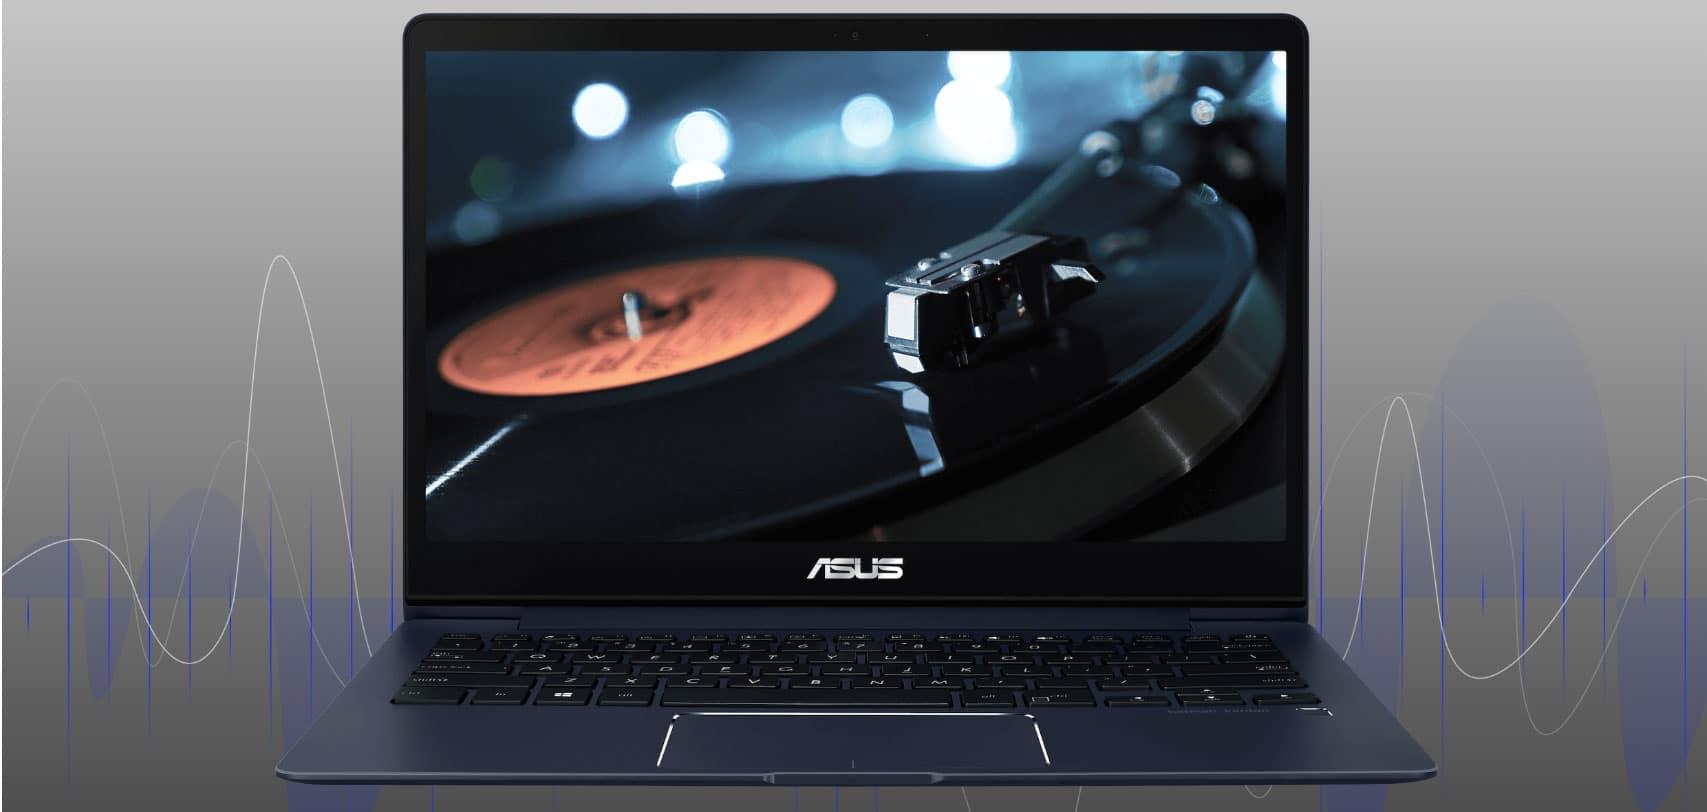 ASUS ZenBook 13 UX331UN – Mỏng nhẹ, tinh tế, sang trọng - 278863